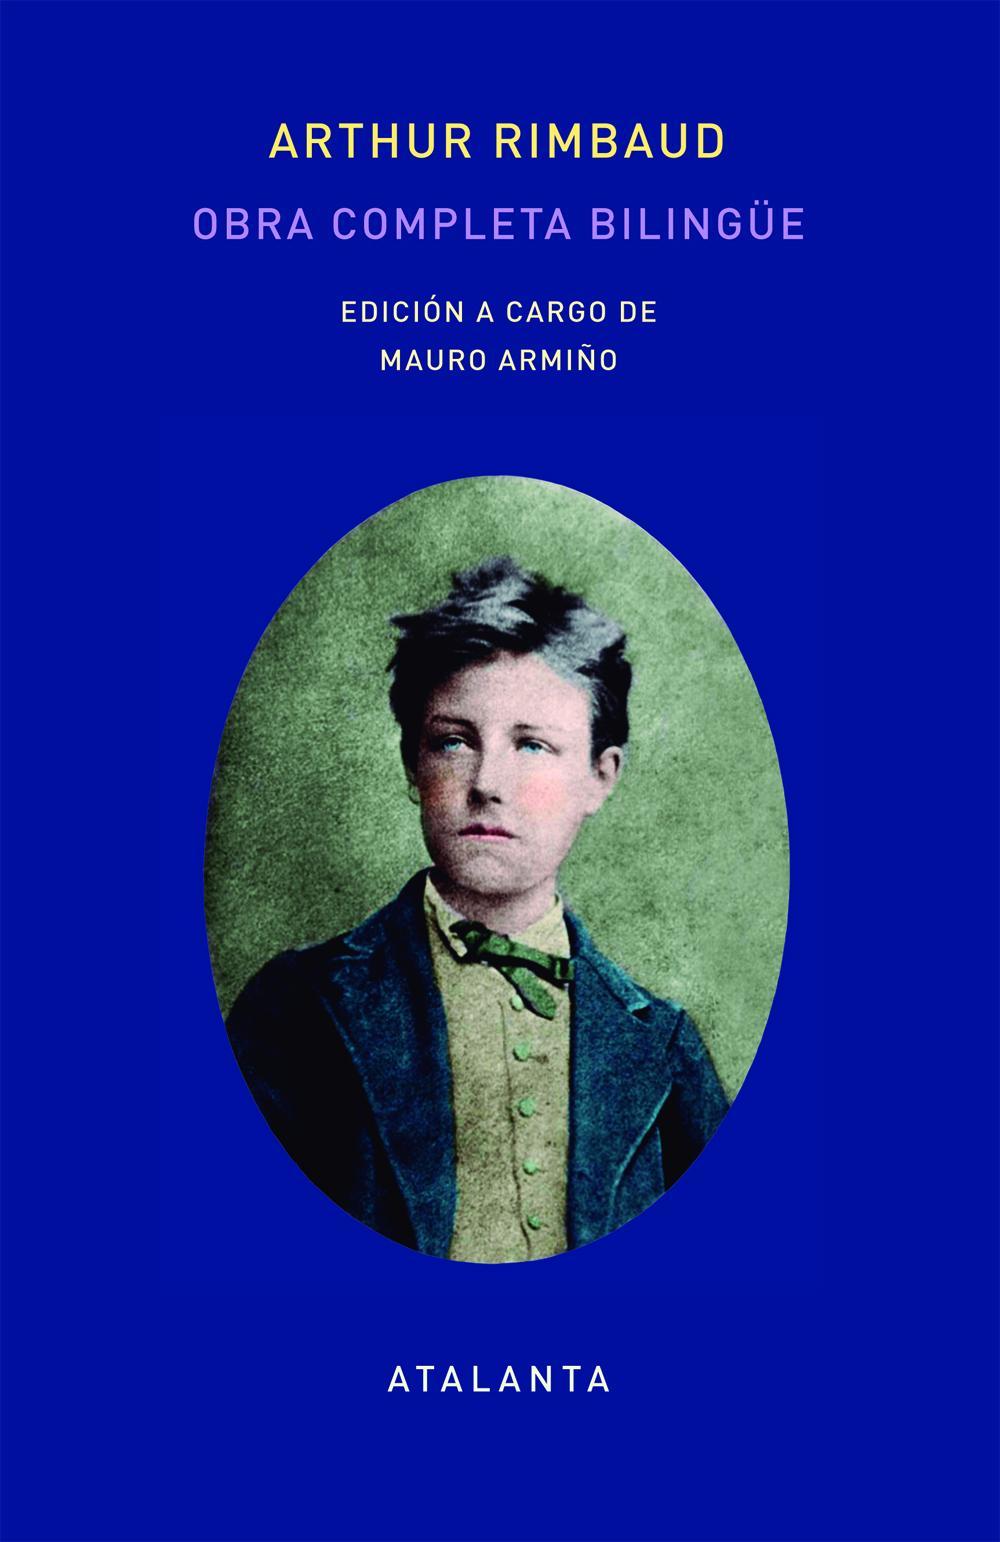 Obra completa de Arthut Rimbaud - Edición bilingüe